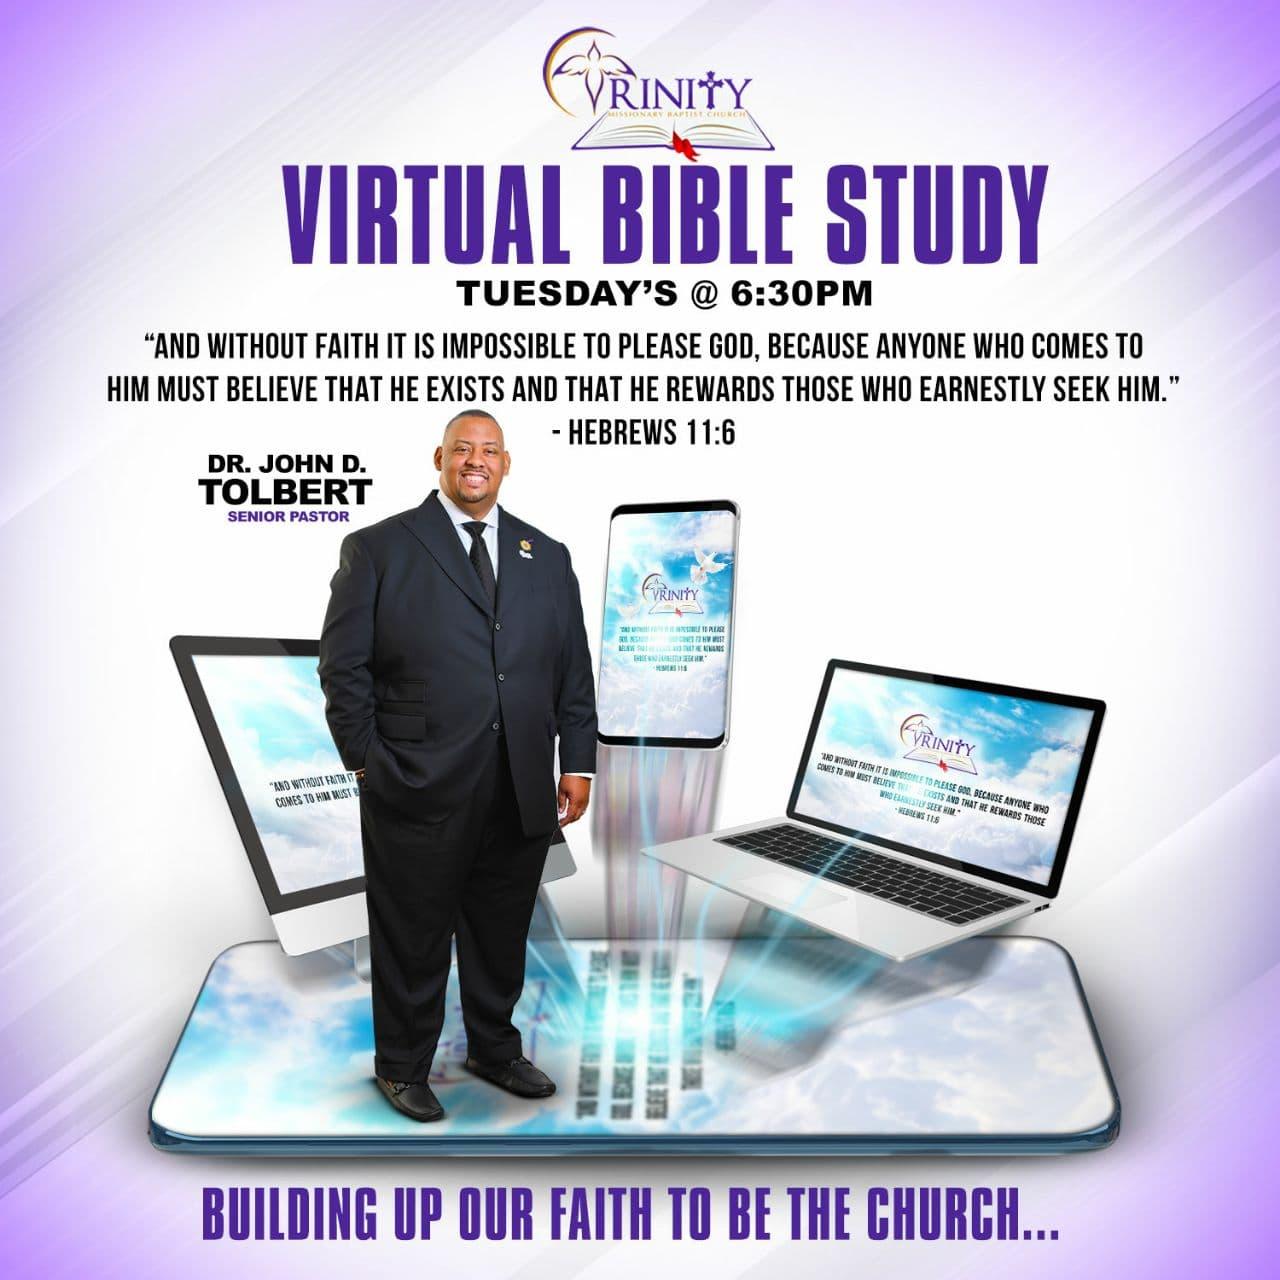 VirtualBibleStudy